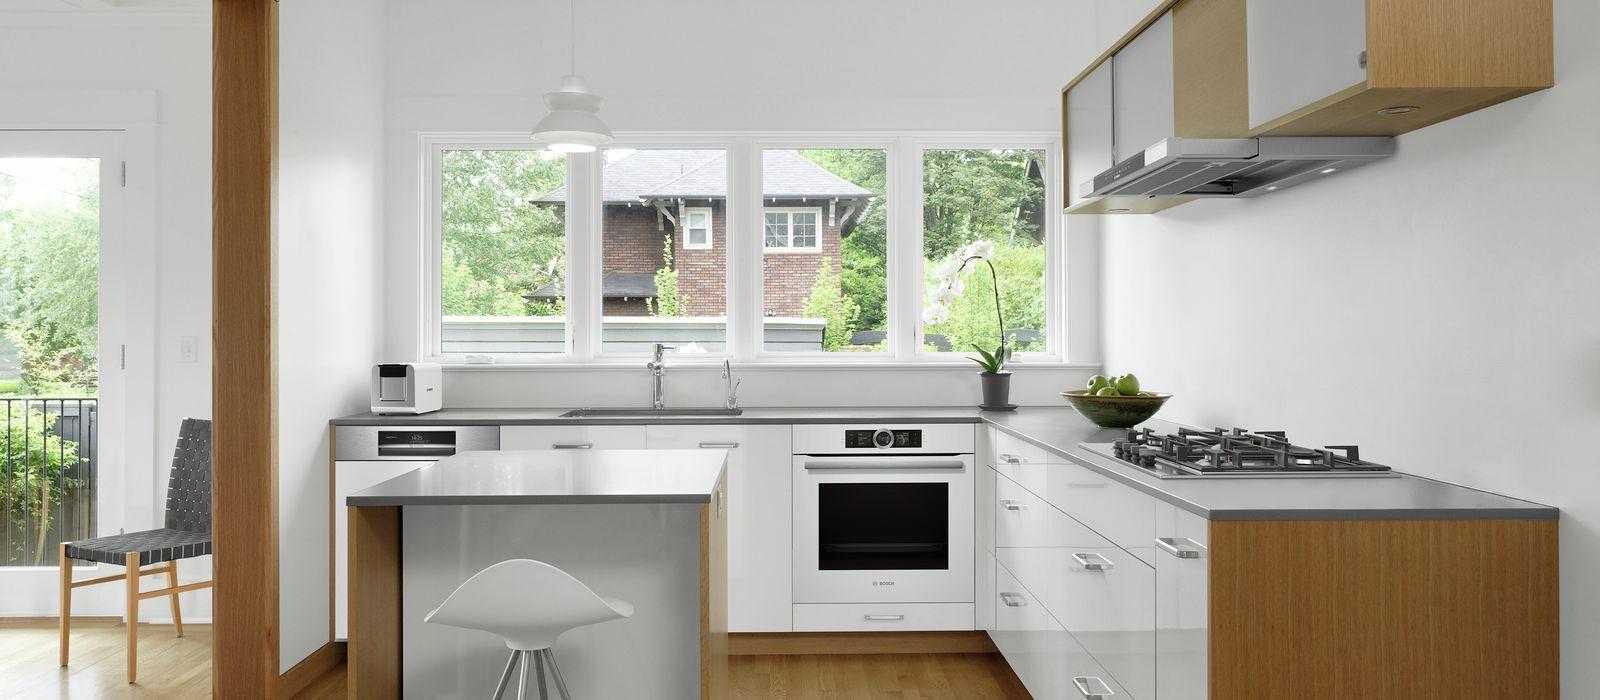 kitchen planners portable island with seating 博世厨房规划师 bosch 全新或改造 按照以下七个步骤规划您的厨房